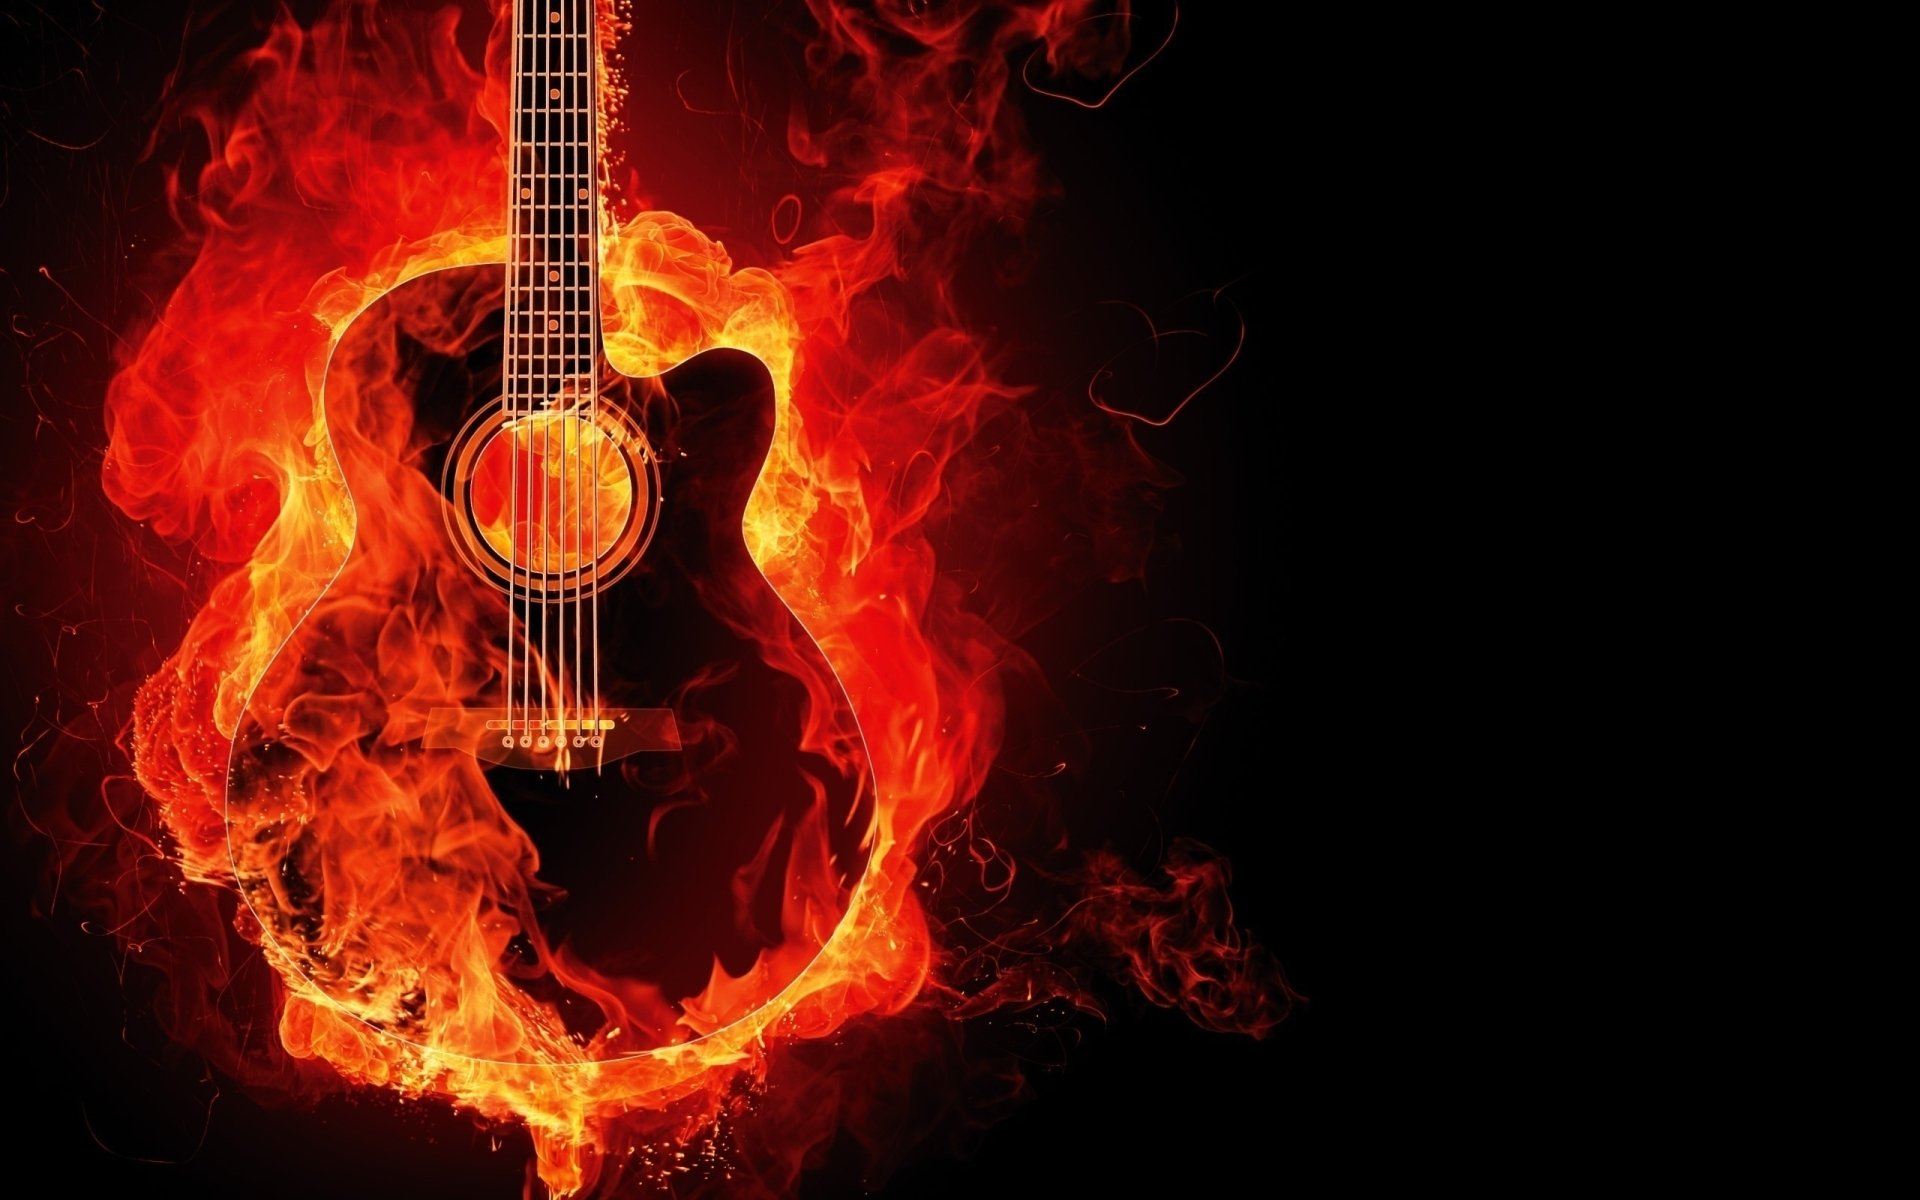 Guitare Full HD Fond d'écran and Arrière-Plan   2560x1600   ID:349923